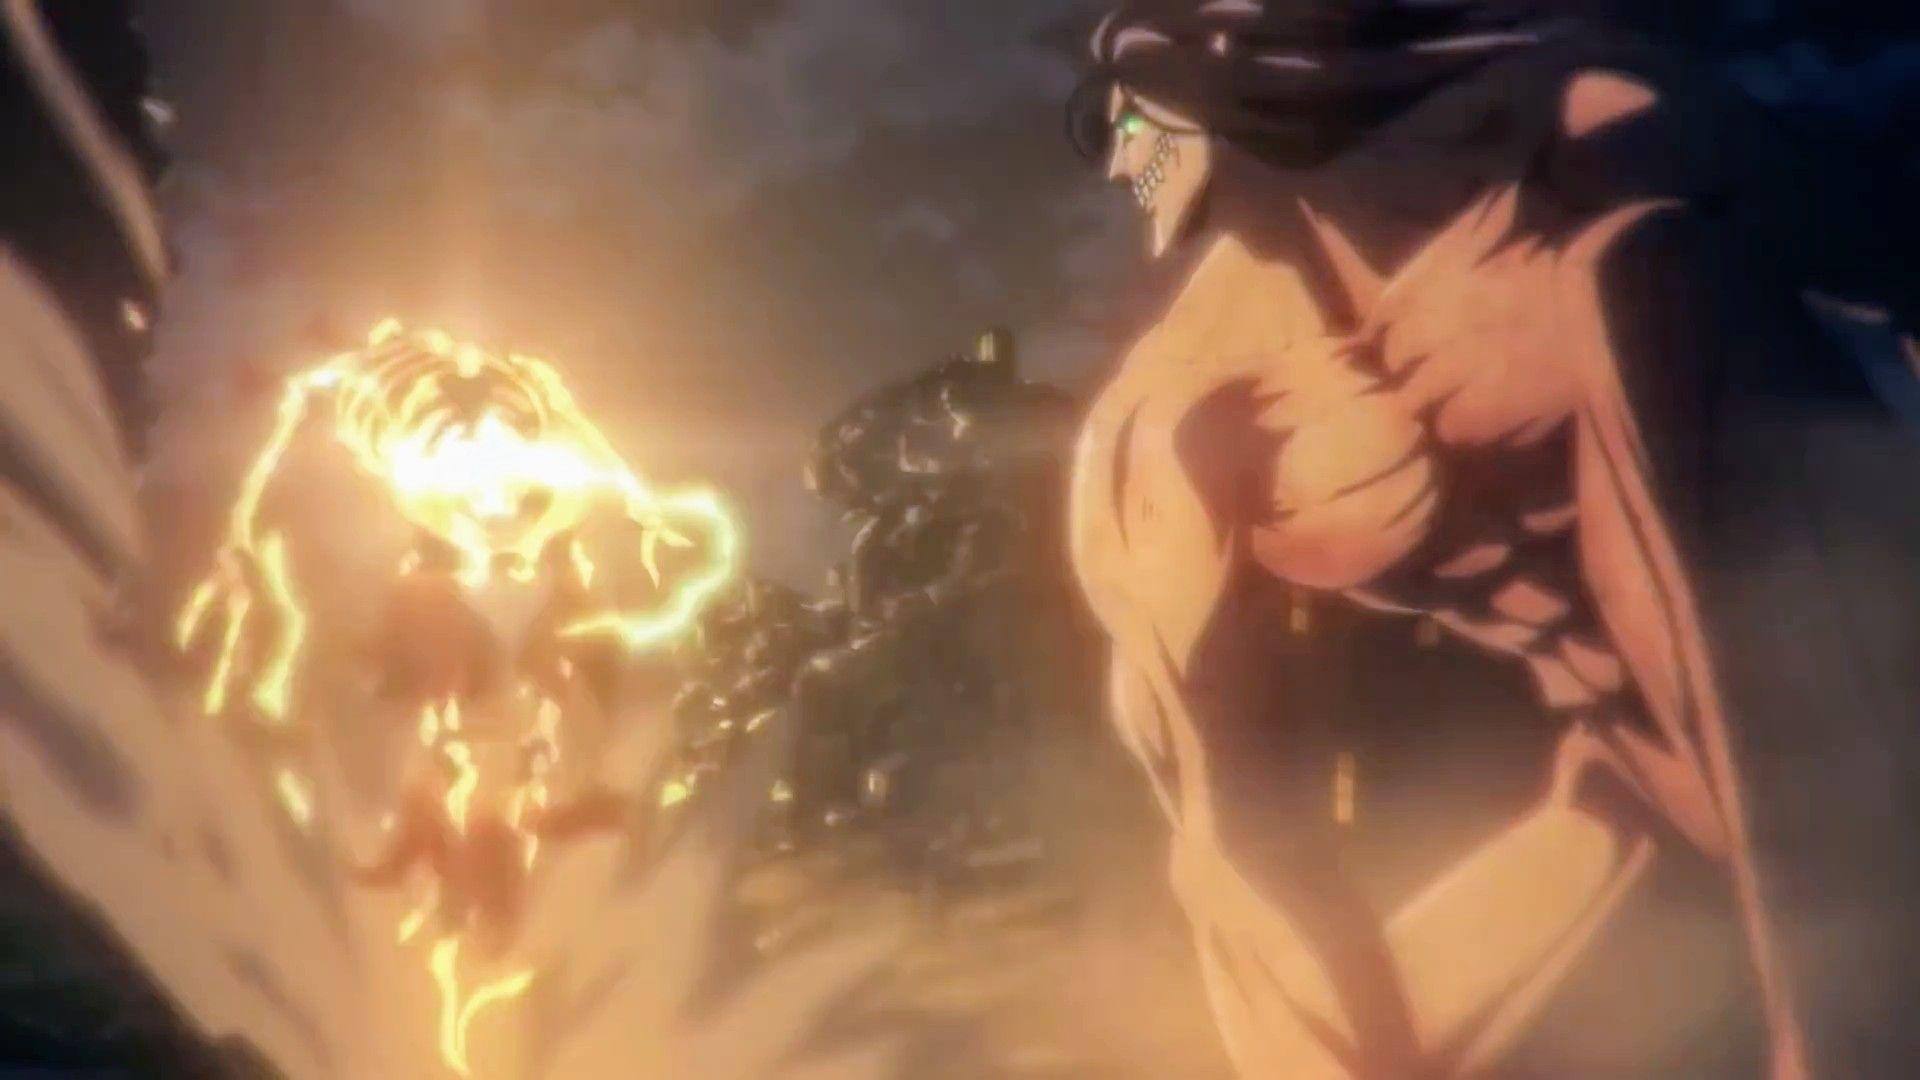 Attack On Titan Final Season Attack On Titan Anime Attack On Titan Aesthetic Anime